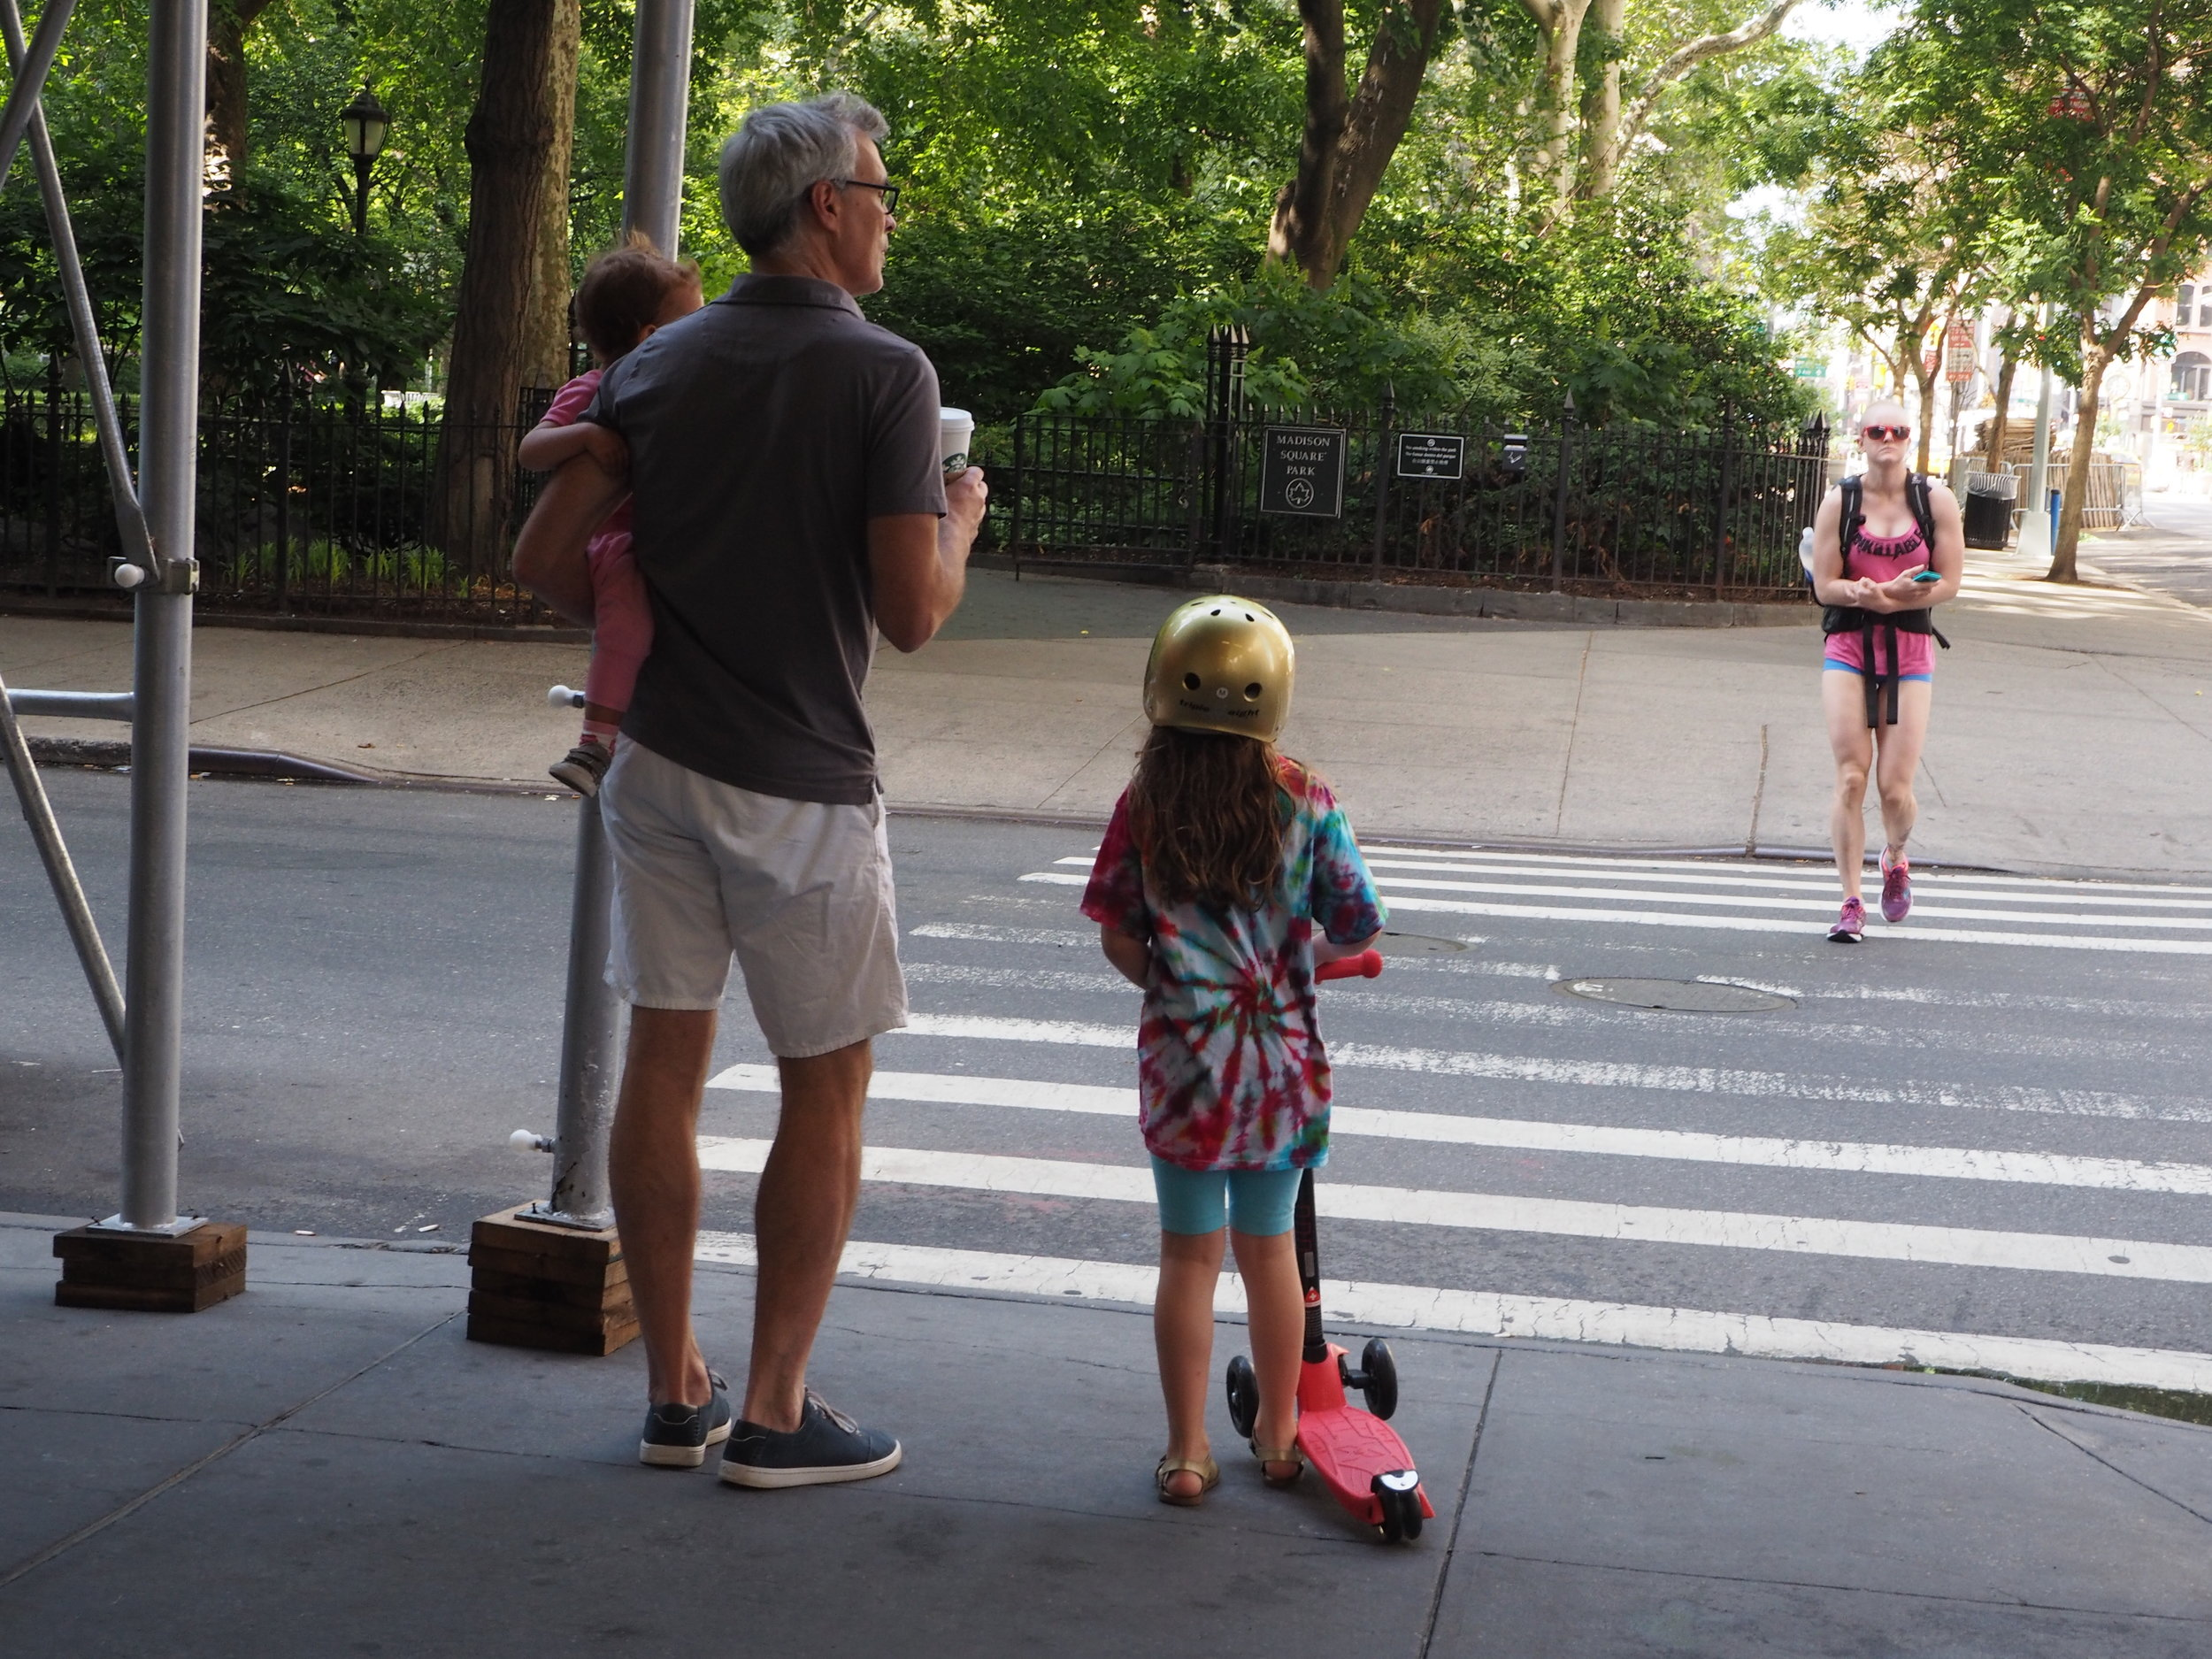 NYC_2015_0432.JPG